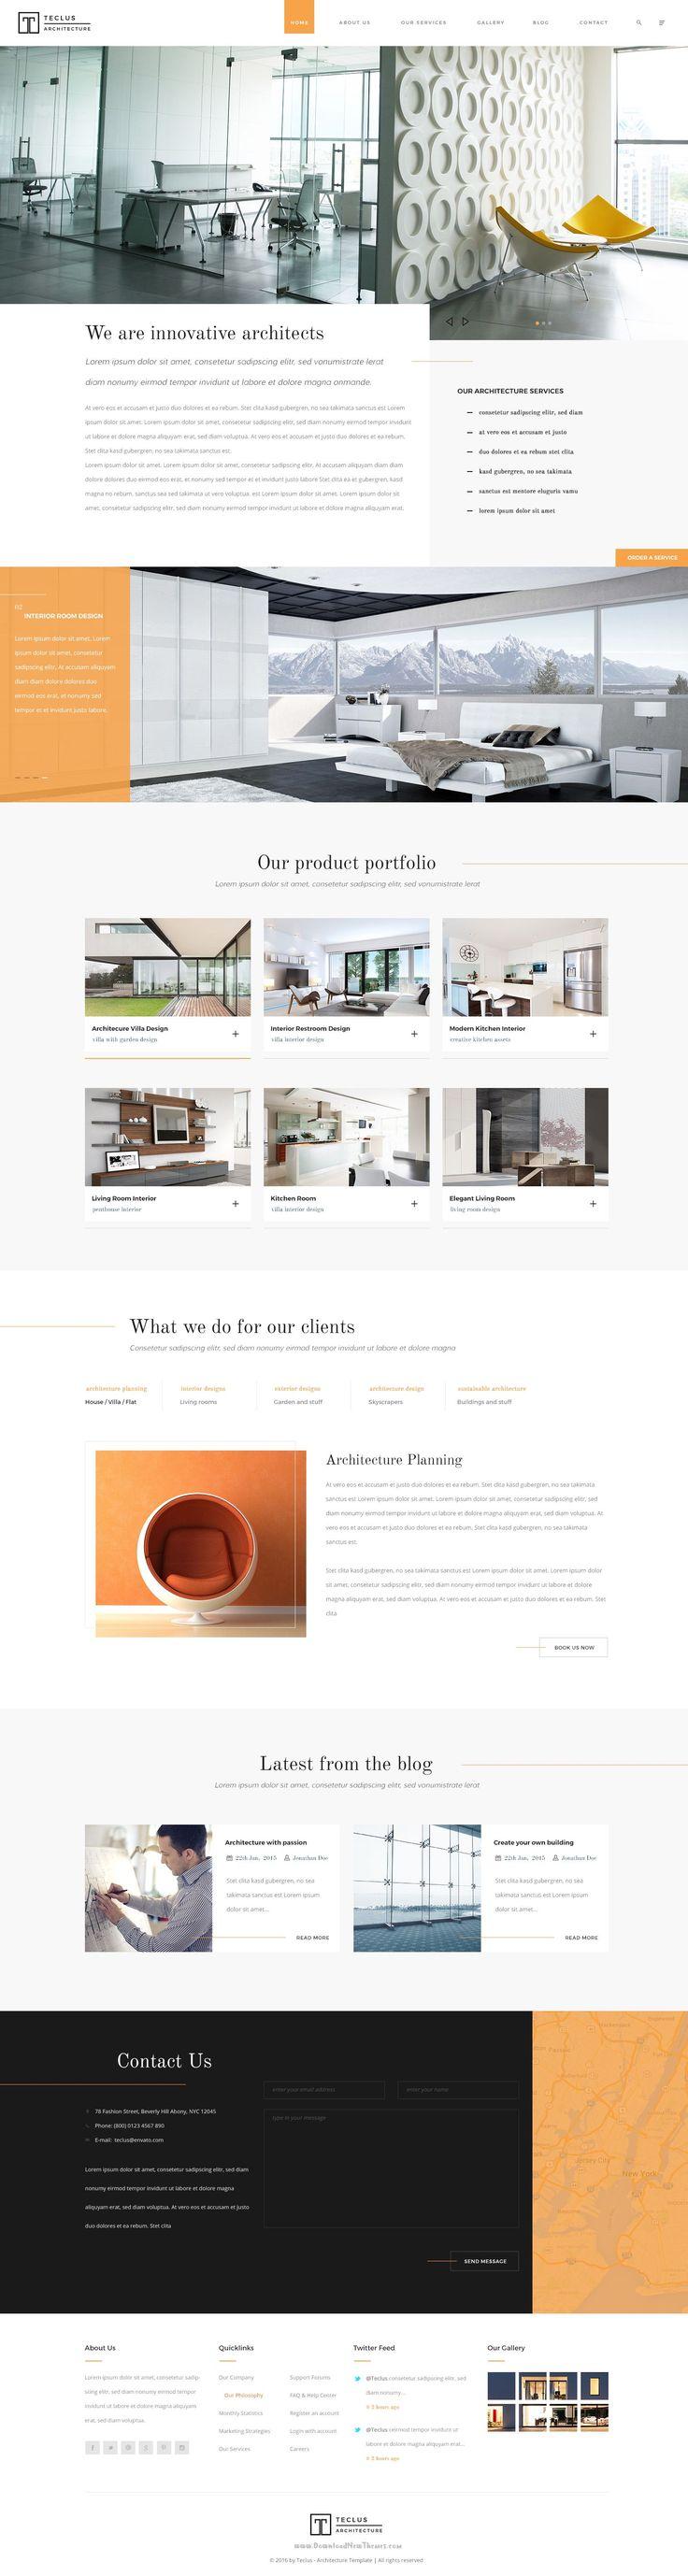 Best 1004 Design // Web Design ideas on Pinterest | Web layout ...